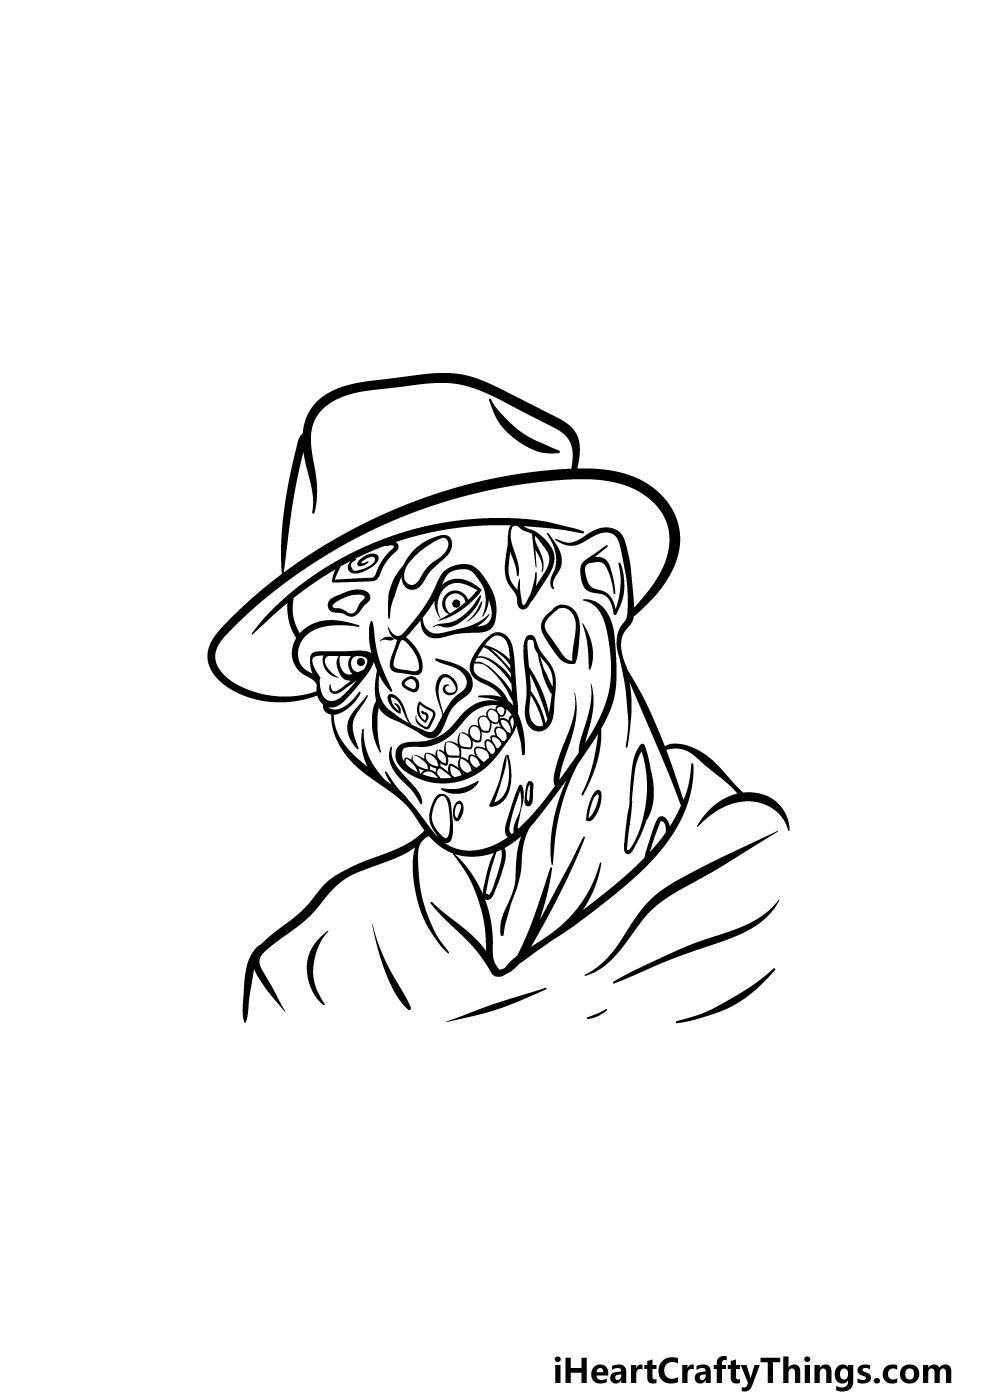 Drawing Freddy Krueger step 5